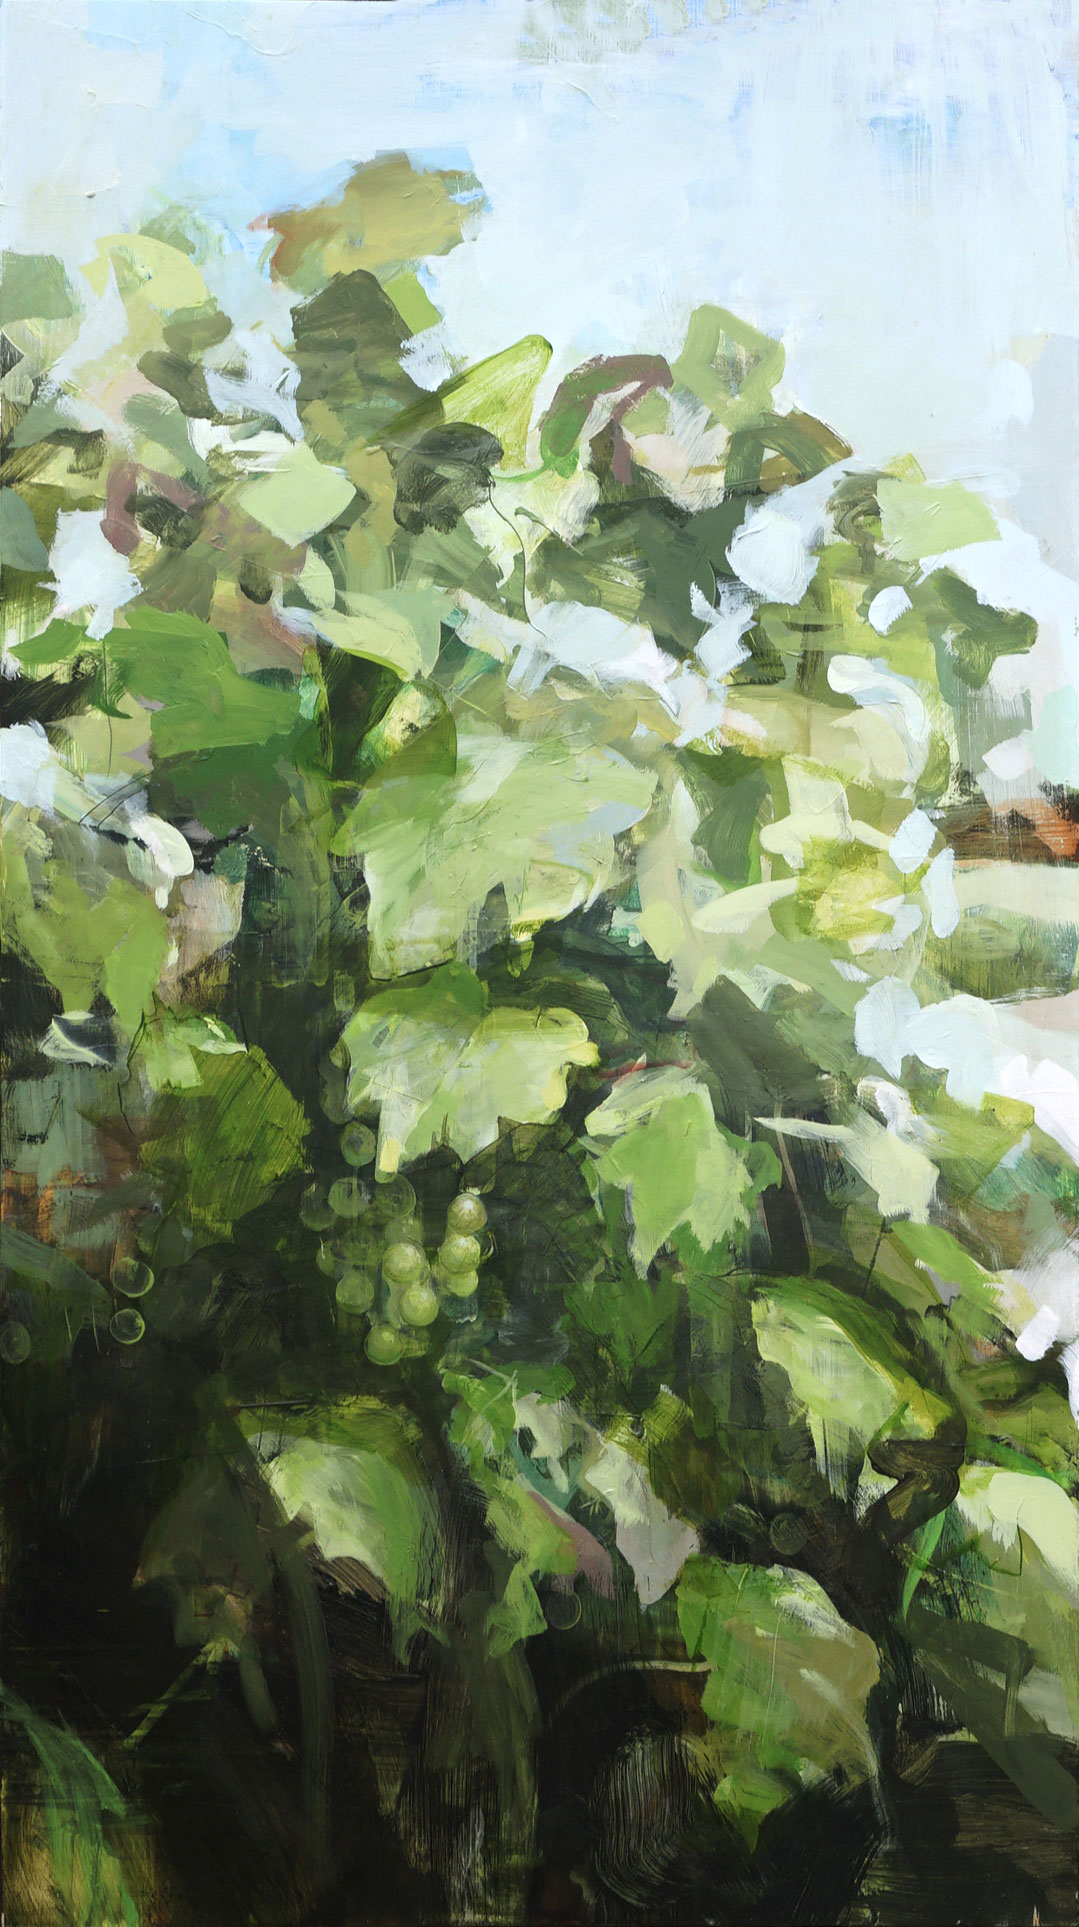 mark-crenshaw-1525-grapevine.jpg